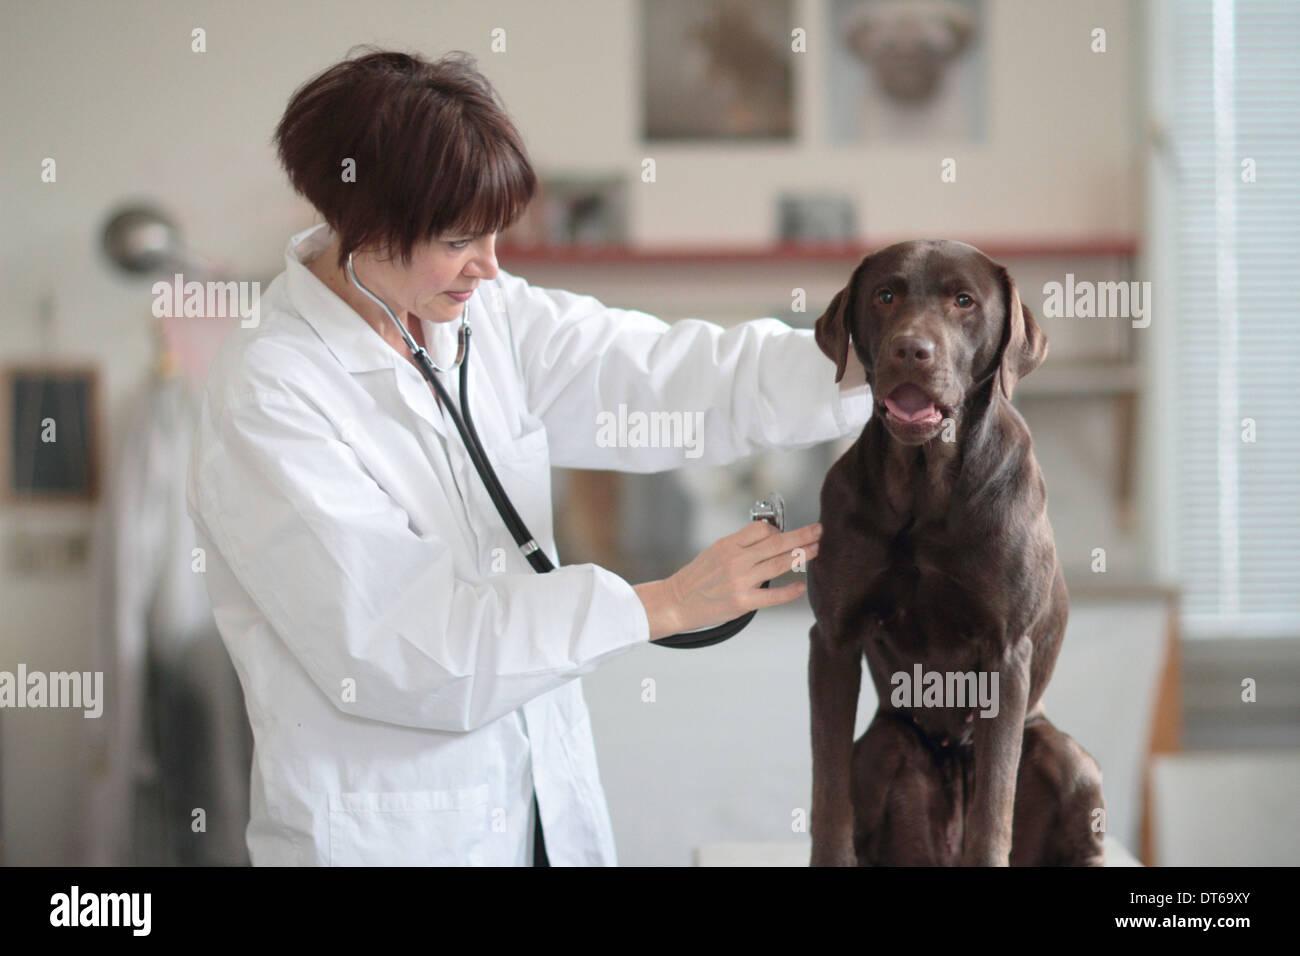 Female veterinarian examining dog in clinic - Stock Image